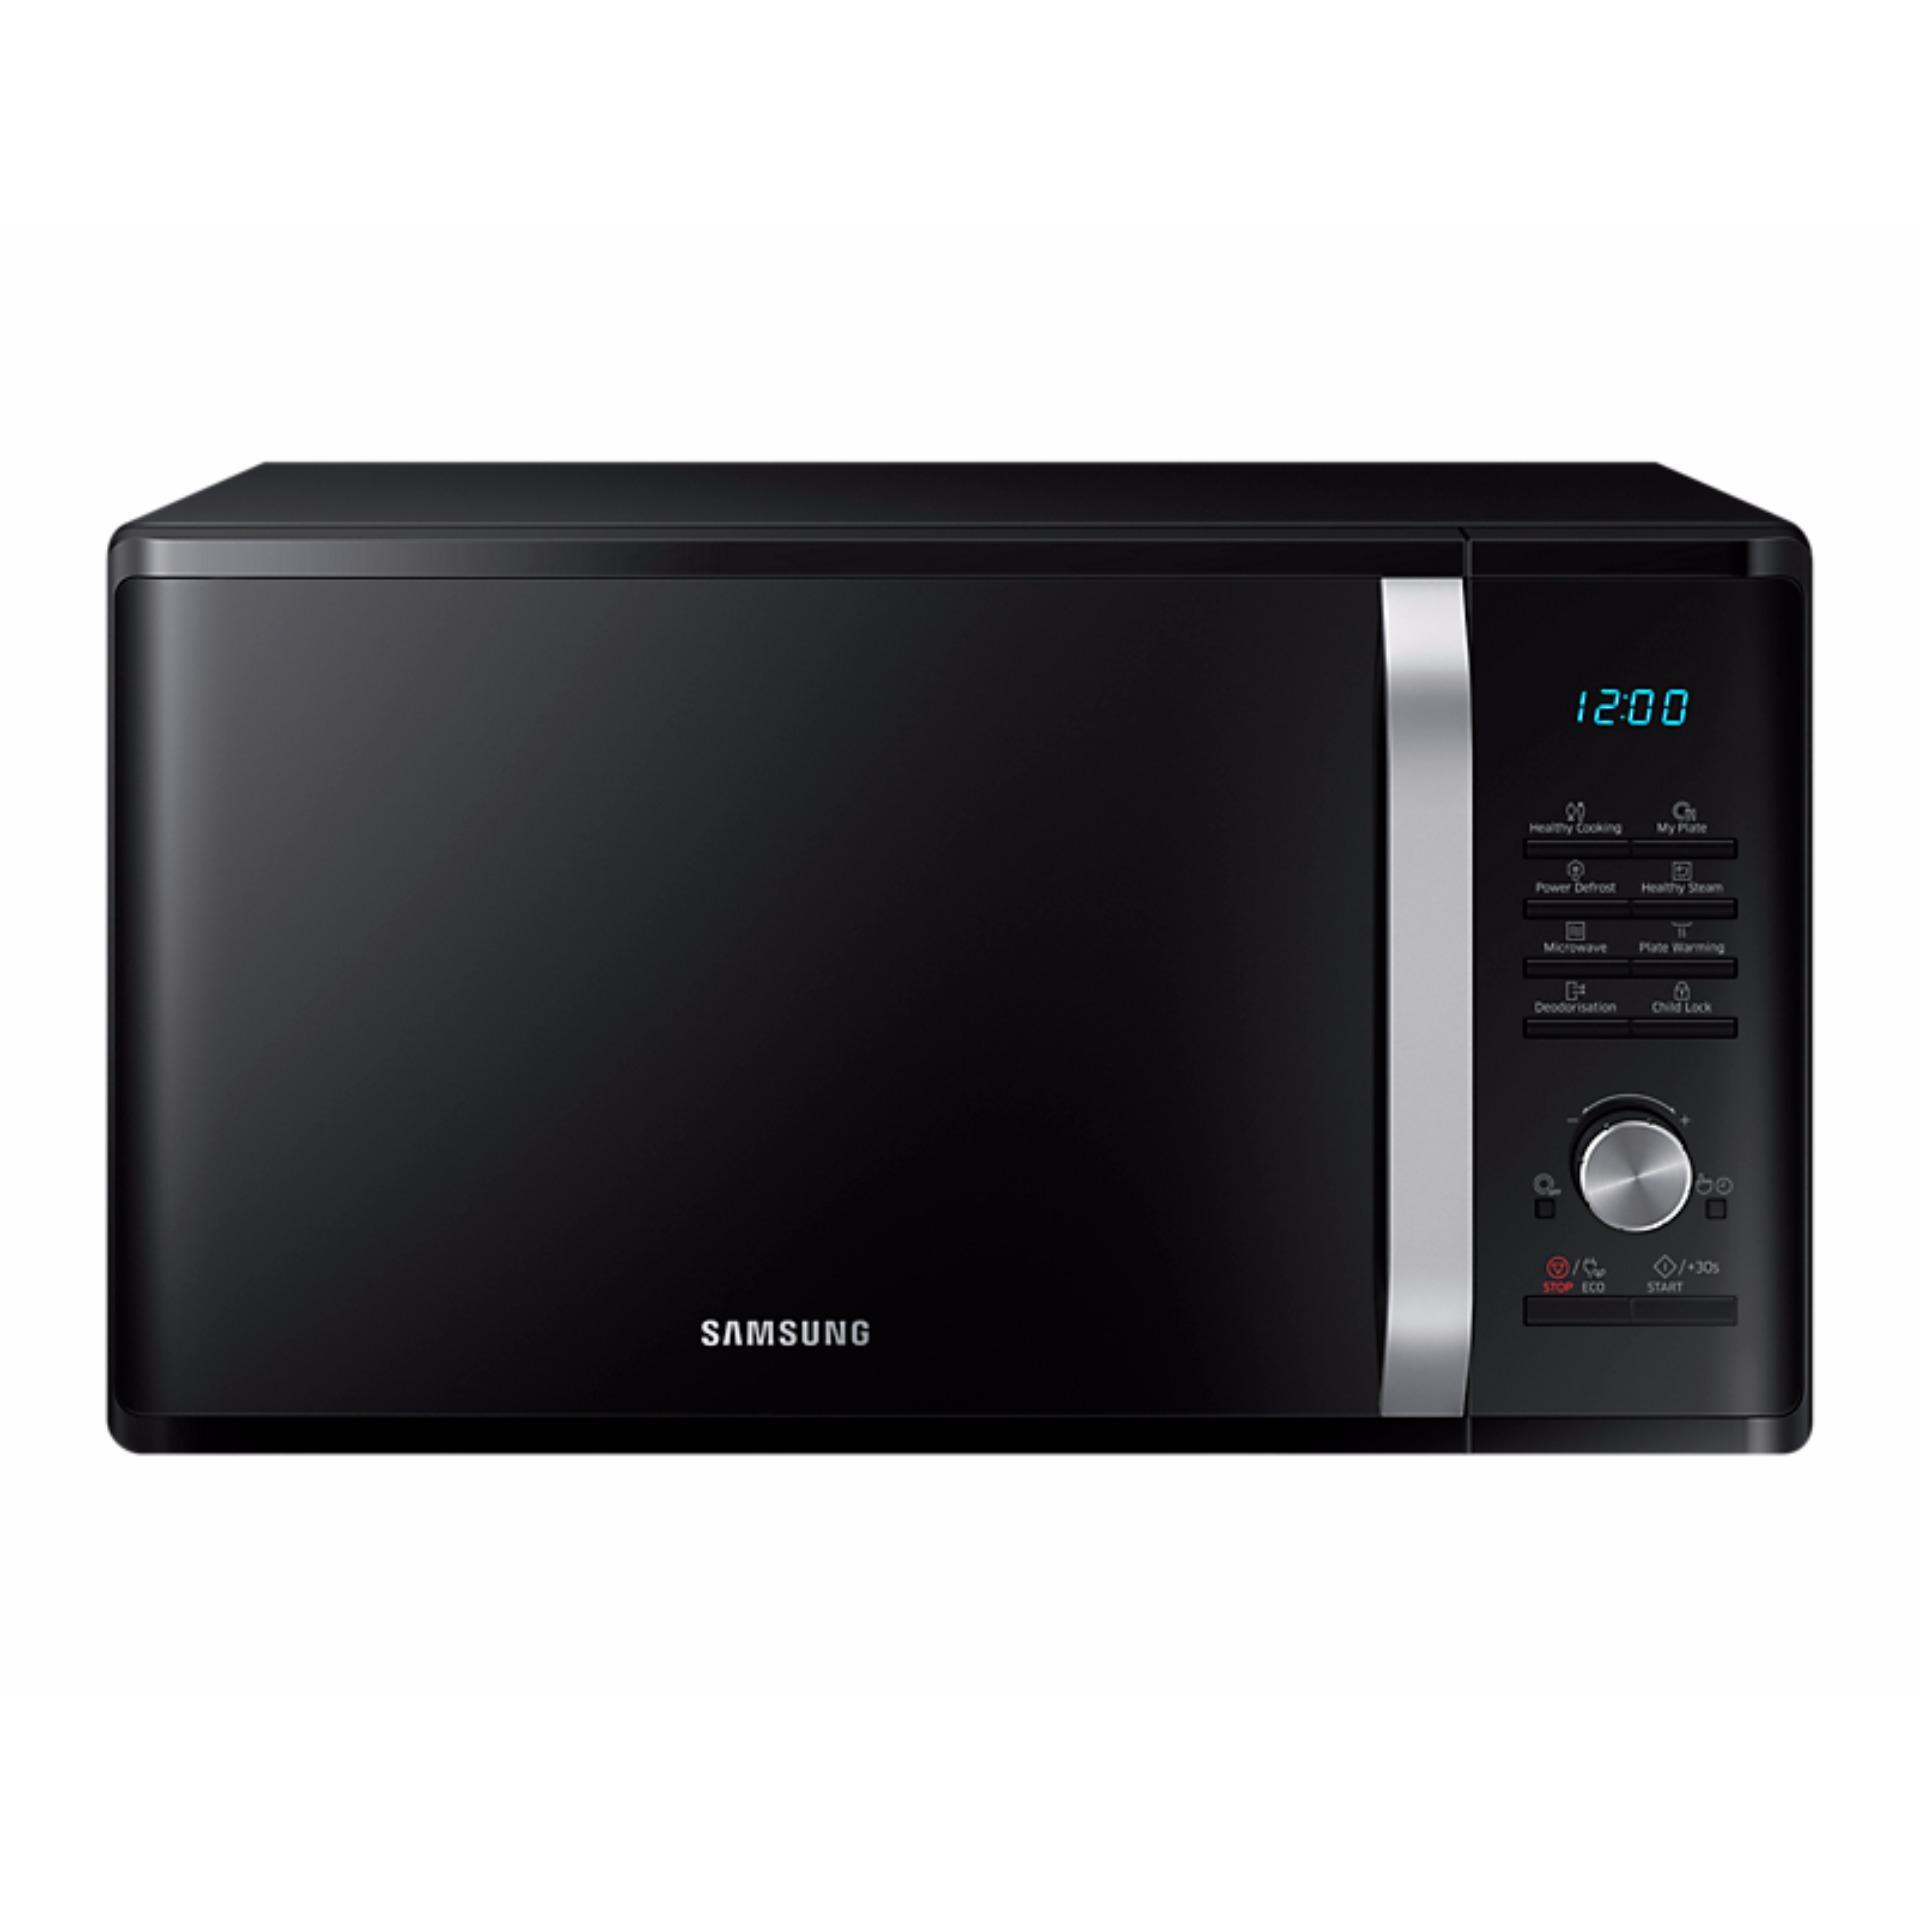 Samsung Microwave MS-28J5255UB